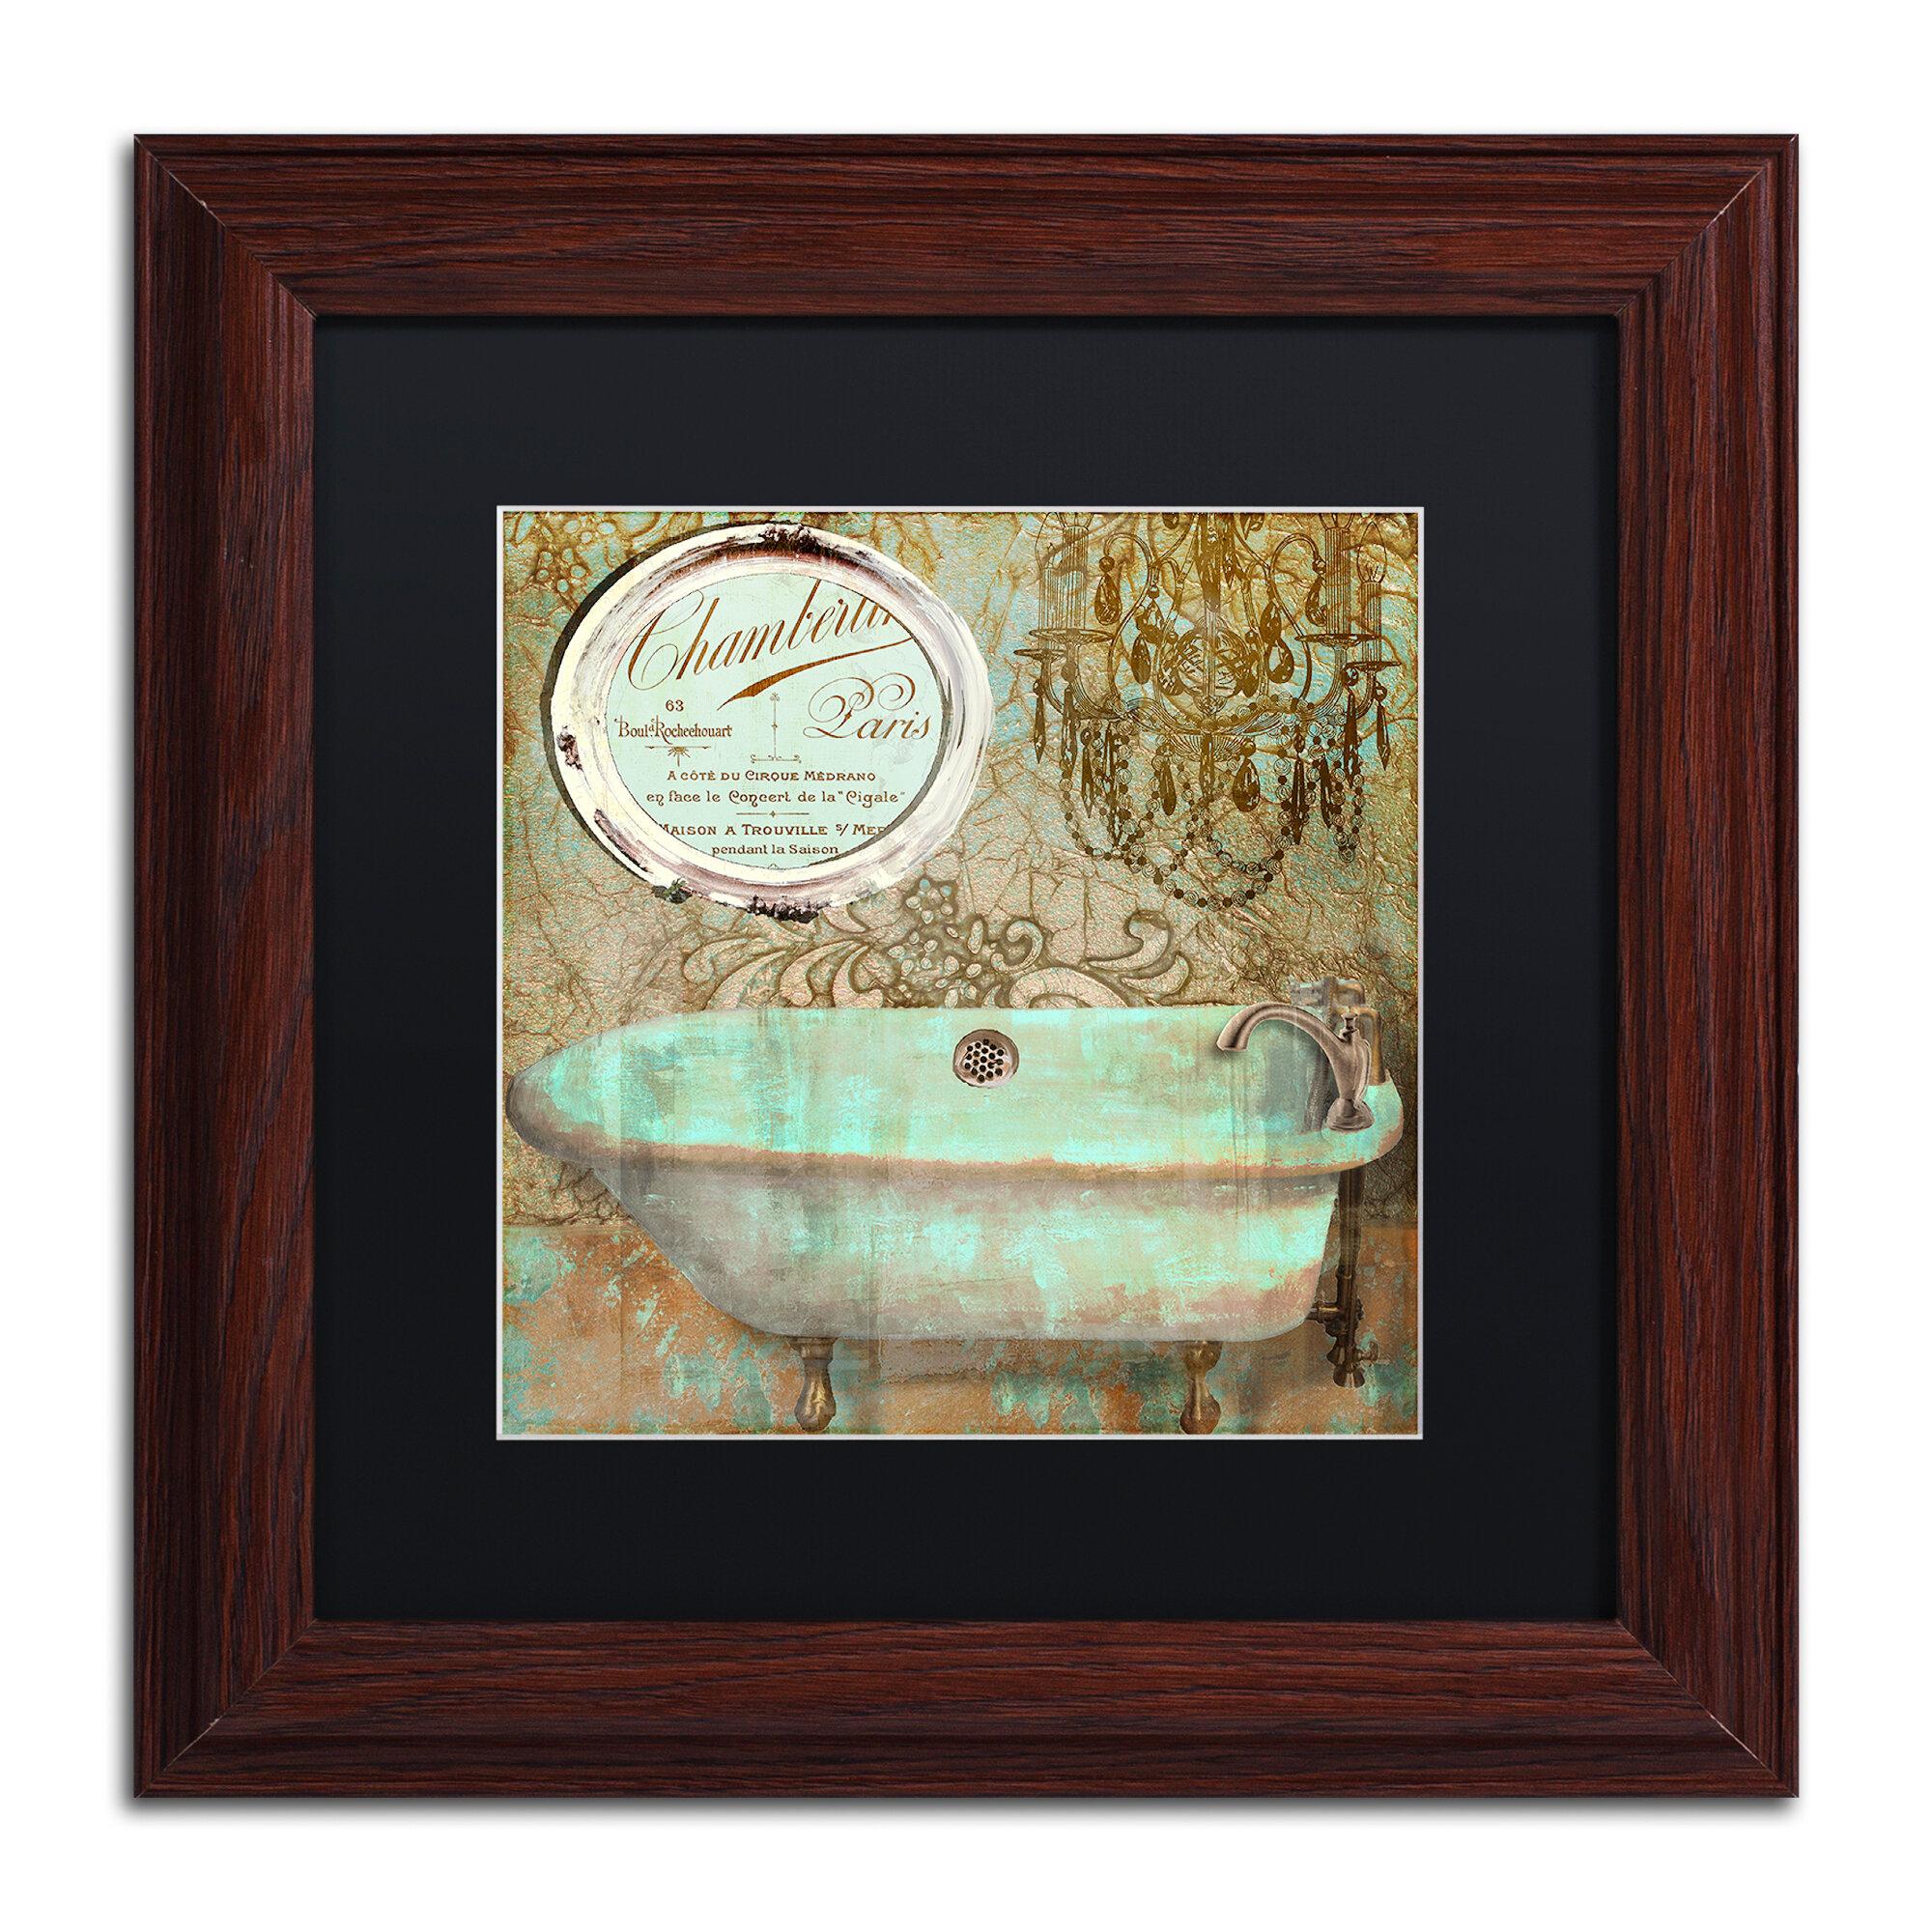 Salle De Bain Idea Group ~ trademark art salle de bain iv by color bakery framed graphic art